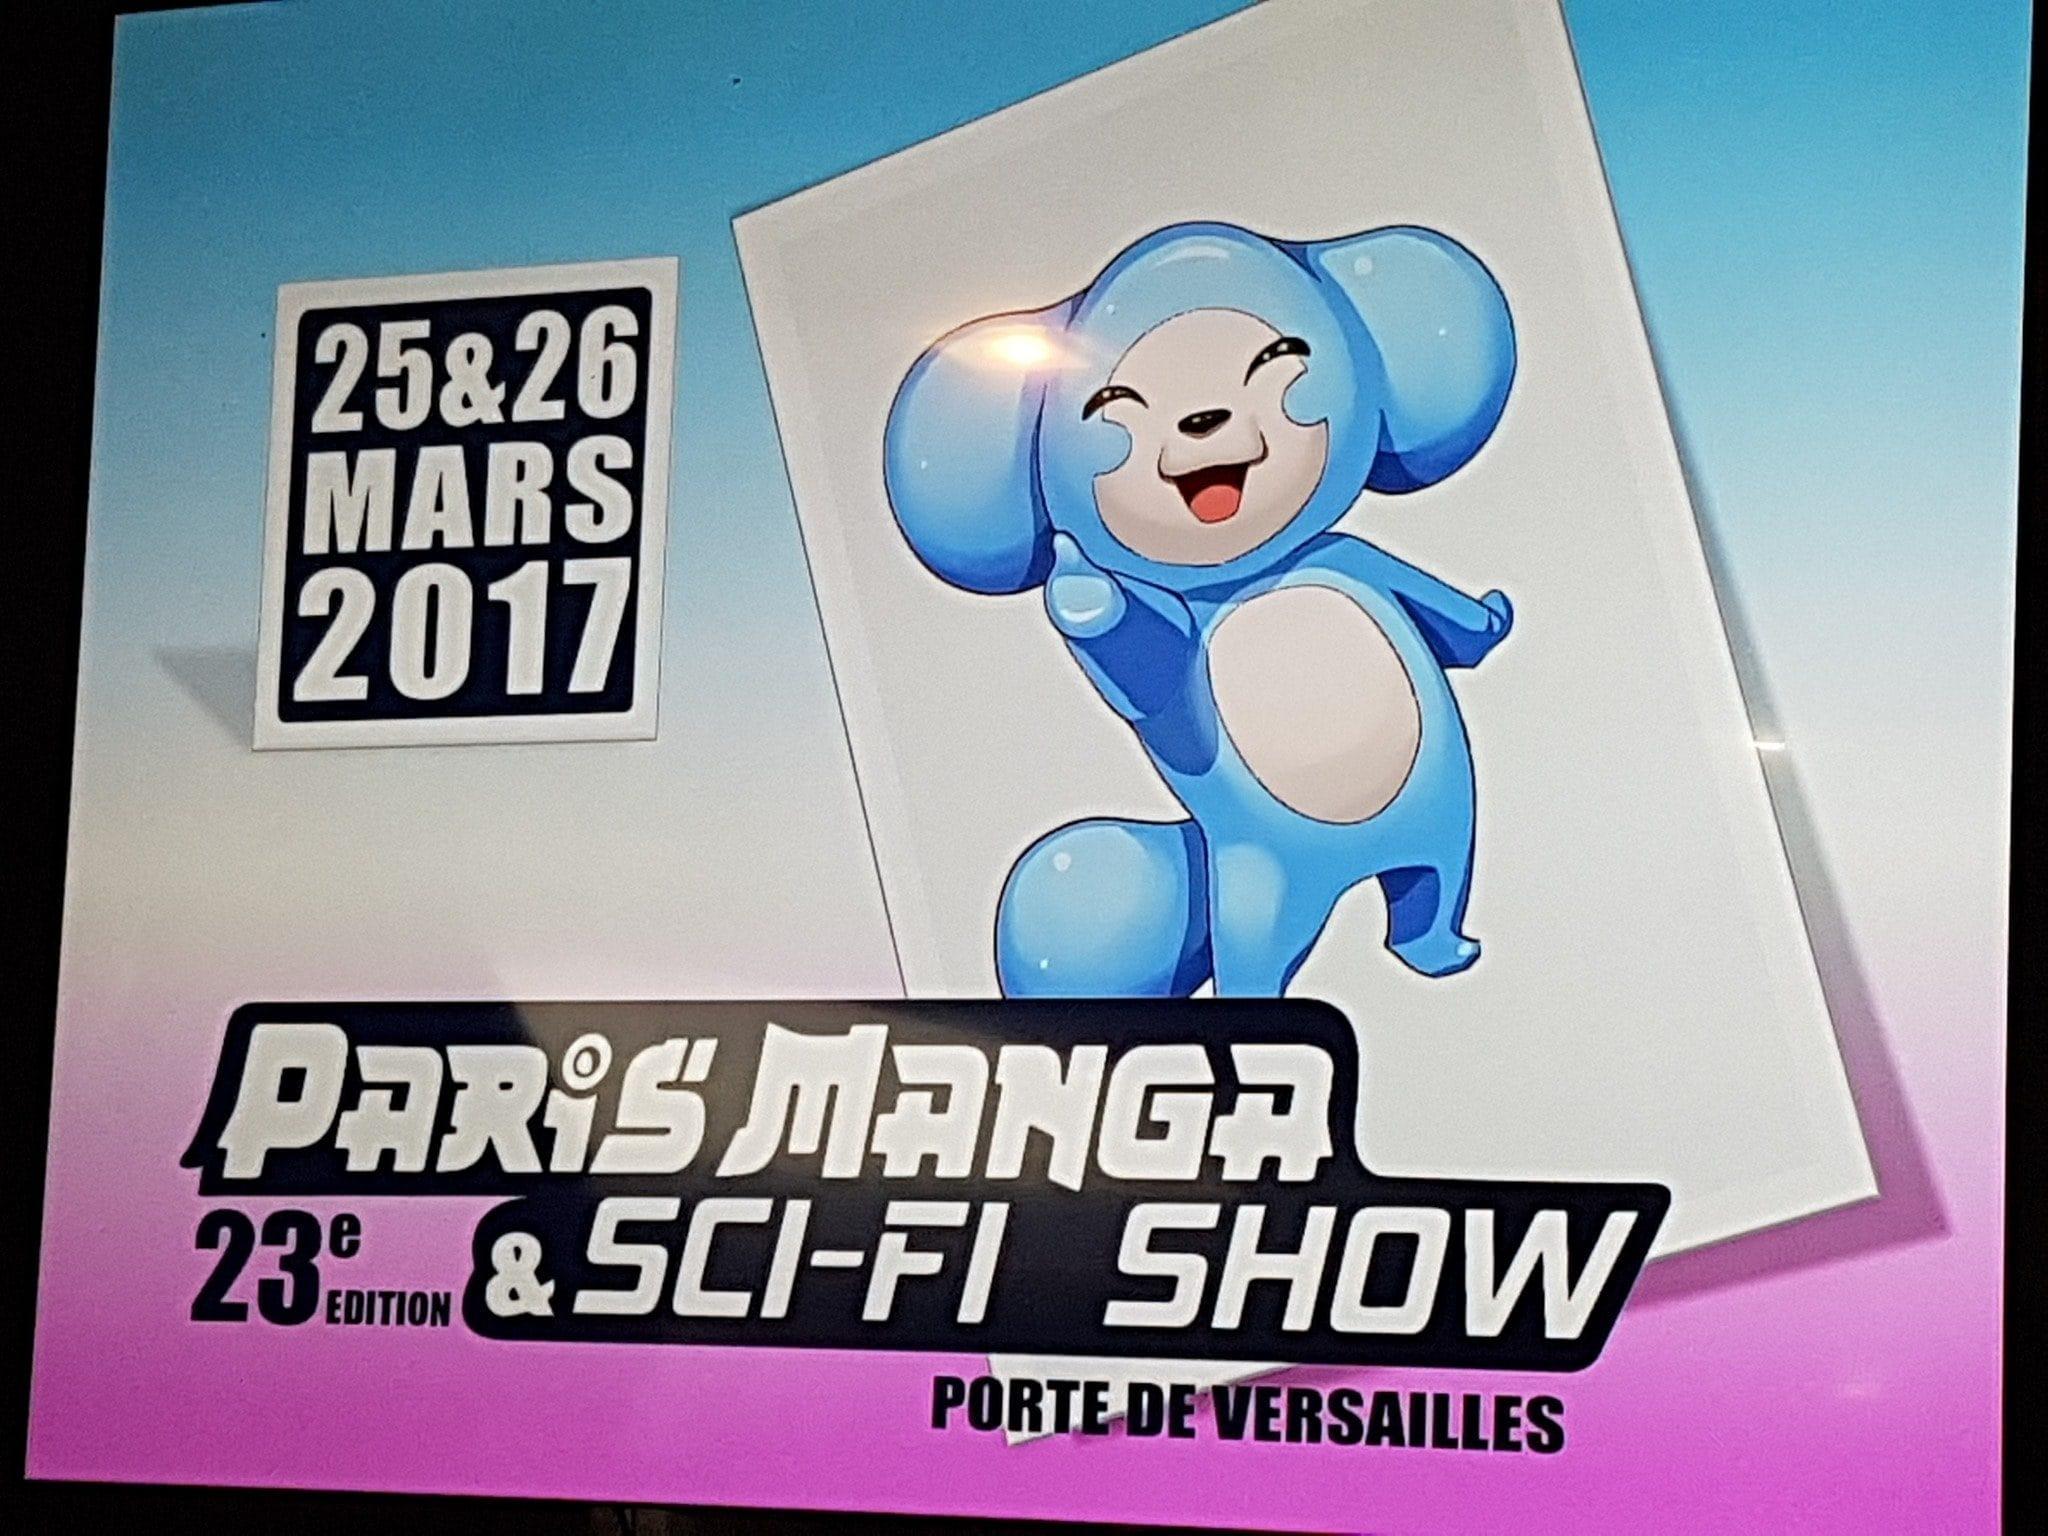 Paris Manga & Sci-Fi Show mars 2017 image-1